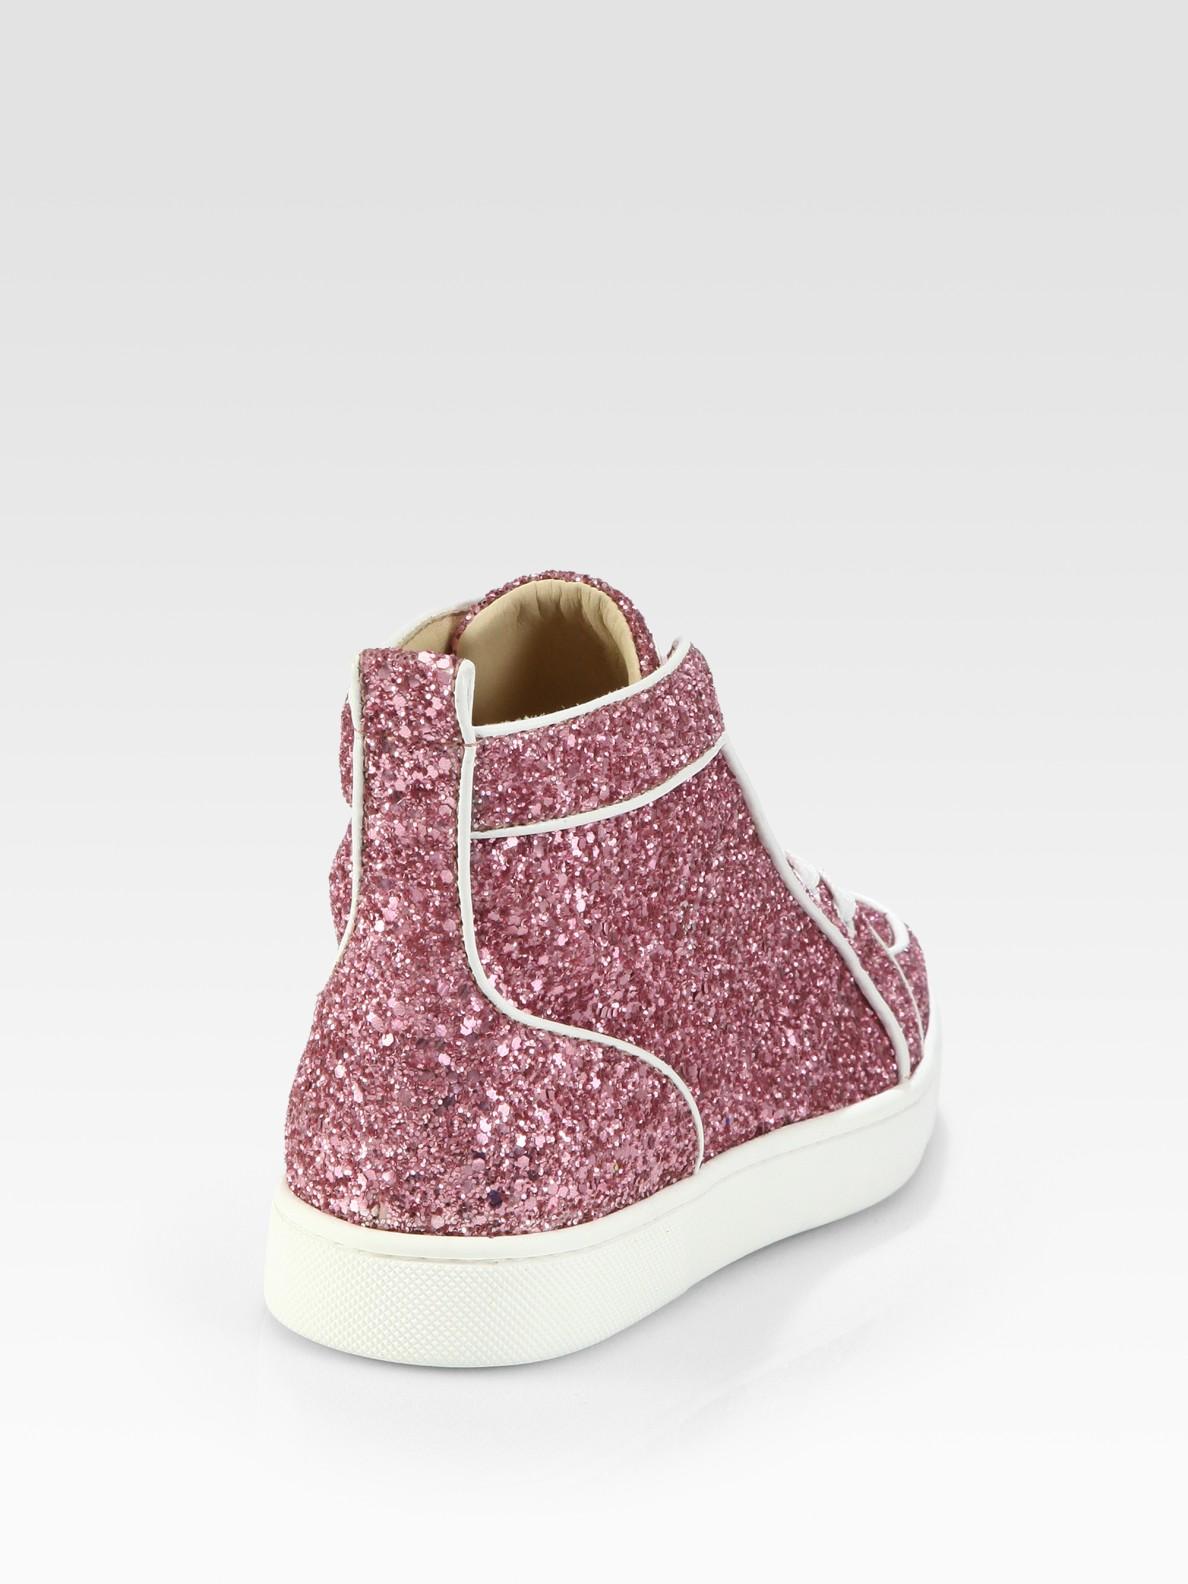 cd7c3f0ffc2 ... ireland lyst christian louboutin rantus orlato glitter sneakers in pink  374bf 9c9ac